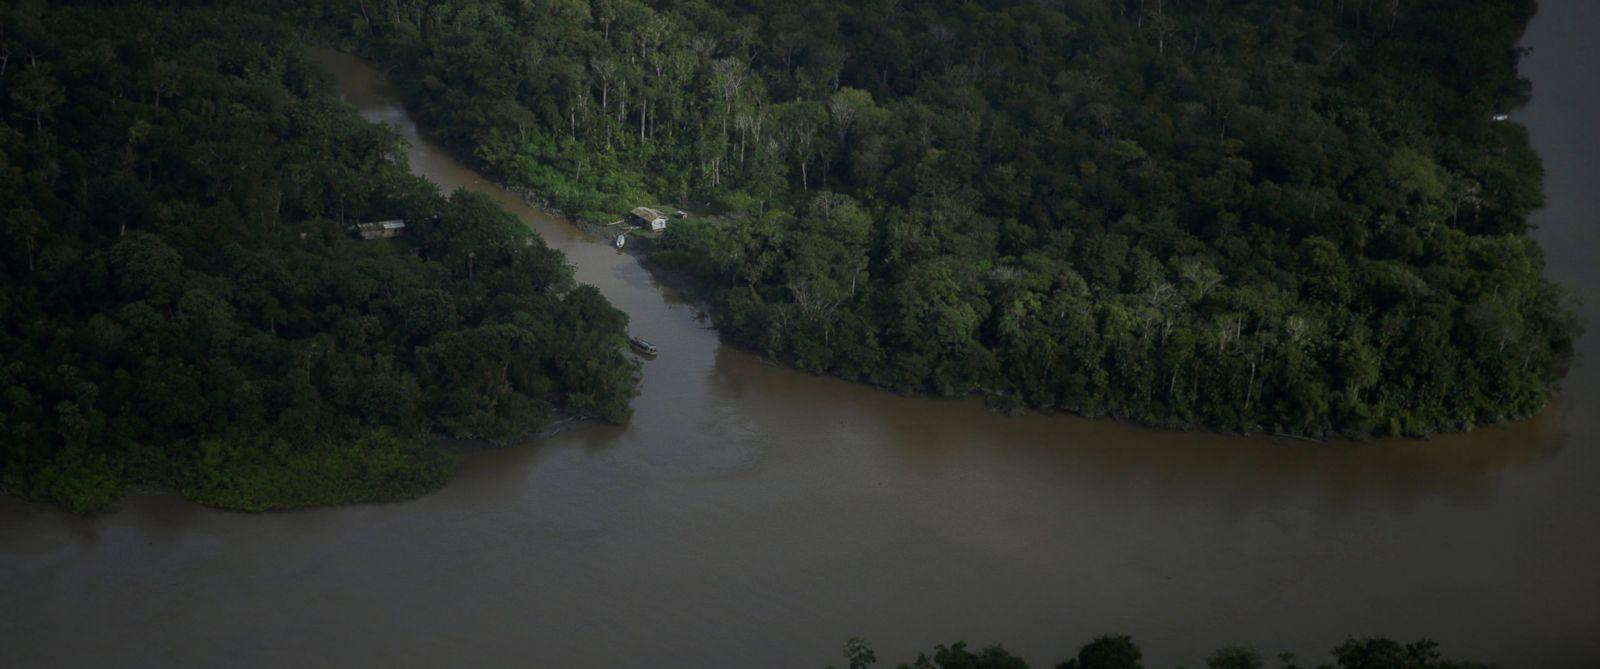 Brazil S New Oil Frontier Threatens Amazon Reef Abc News